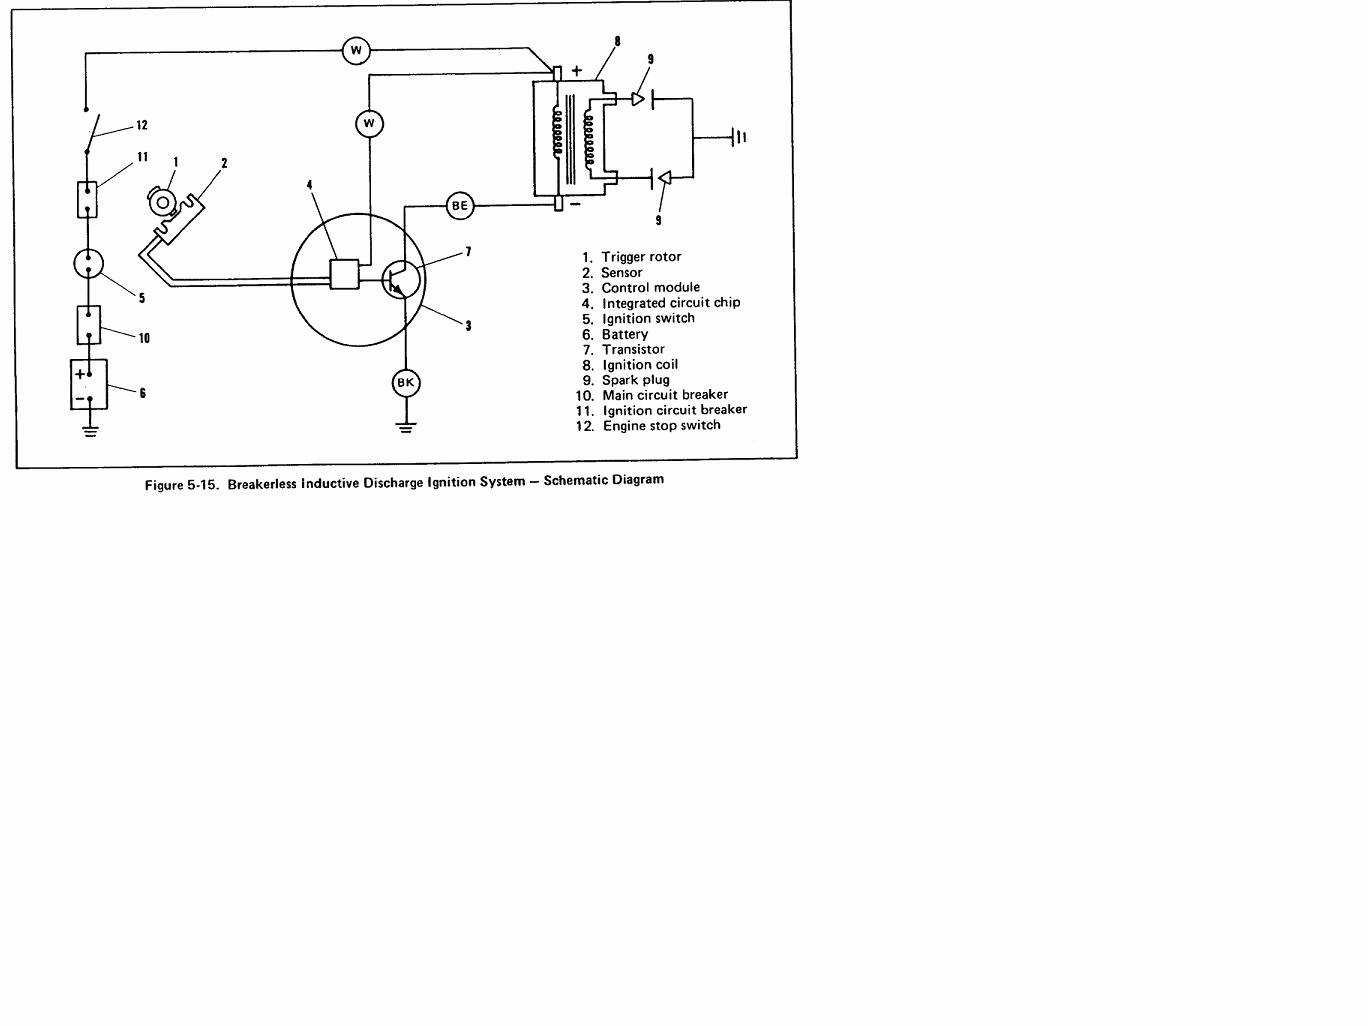 Dynatek Ignition Wiring Diagram - Schema Diagram Database on harley starter relay wiring diagram, harley ignition coil wiring diagram, harley dyna ignition wiring diagram,